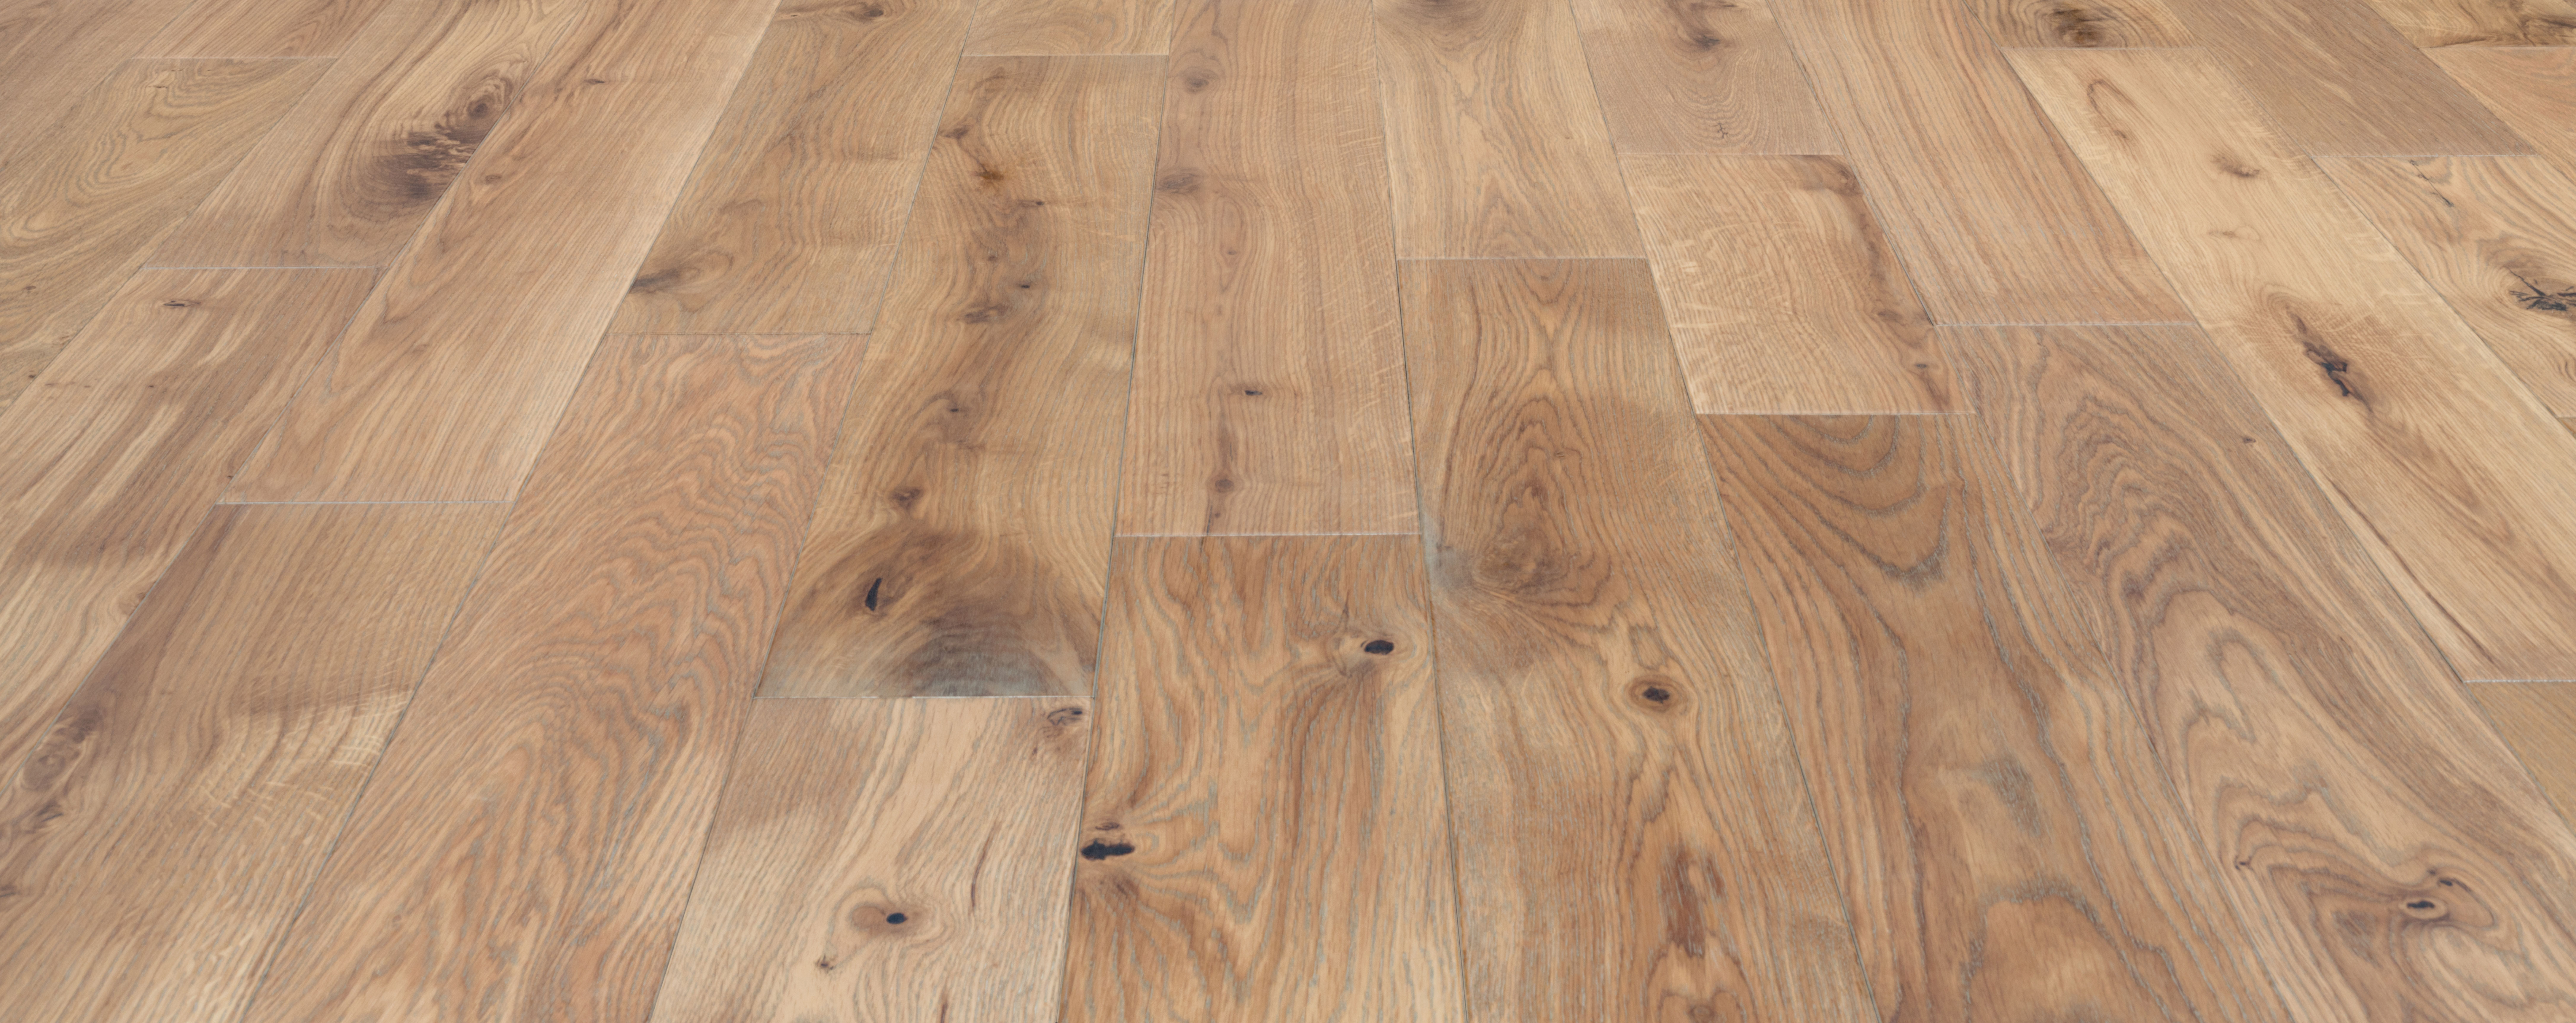 floor memories sweet oak proeng handcrafted big image q r mirage flooring carousel hardwood white